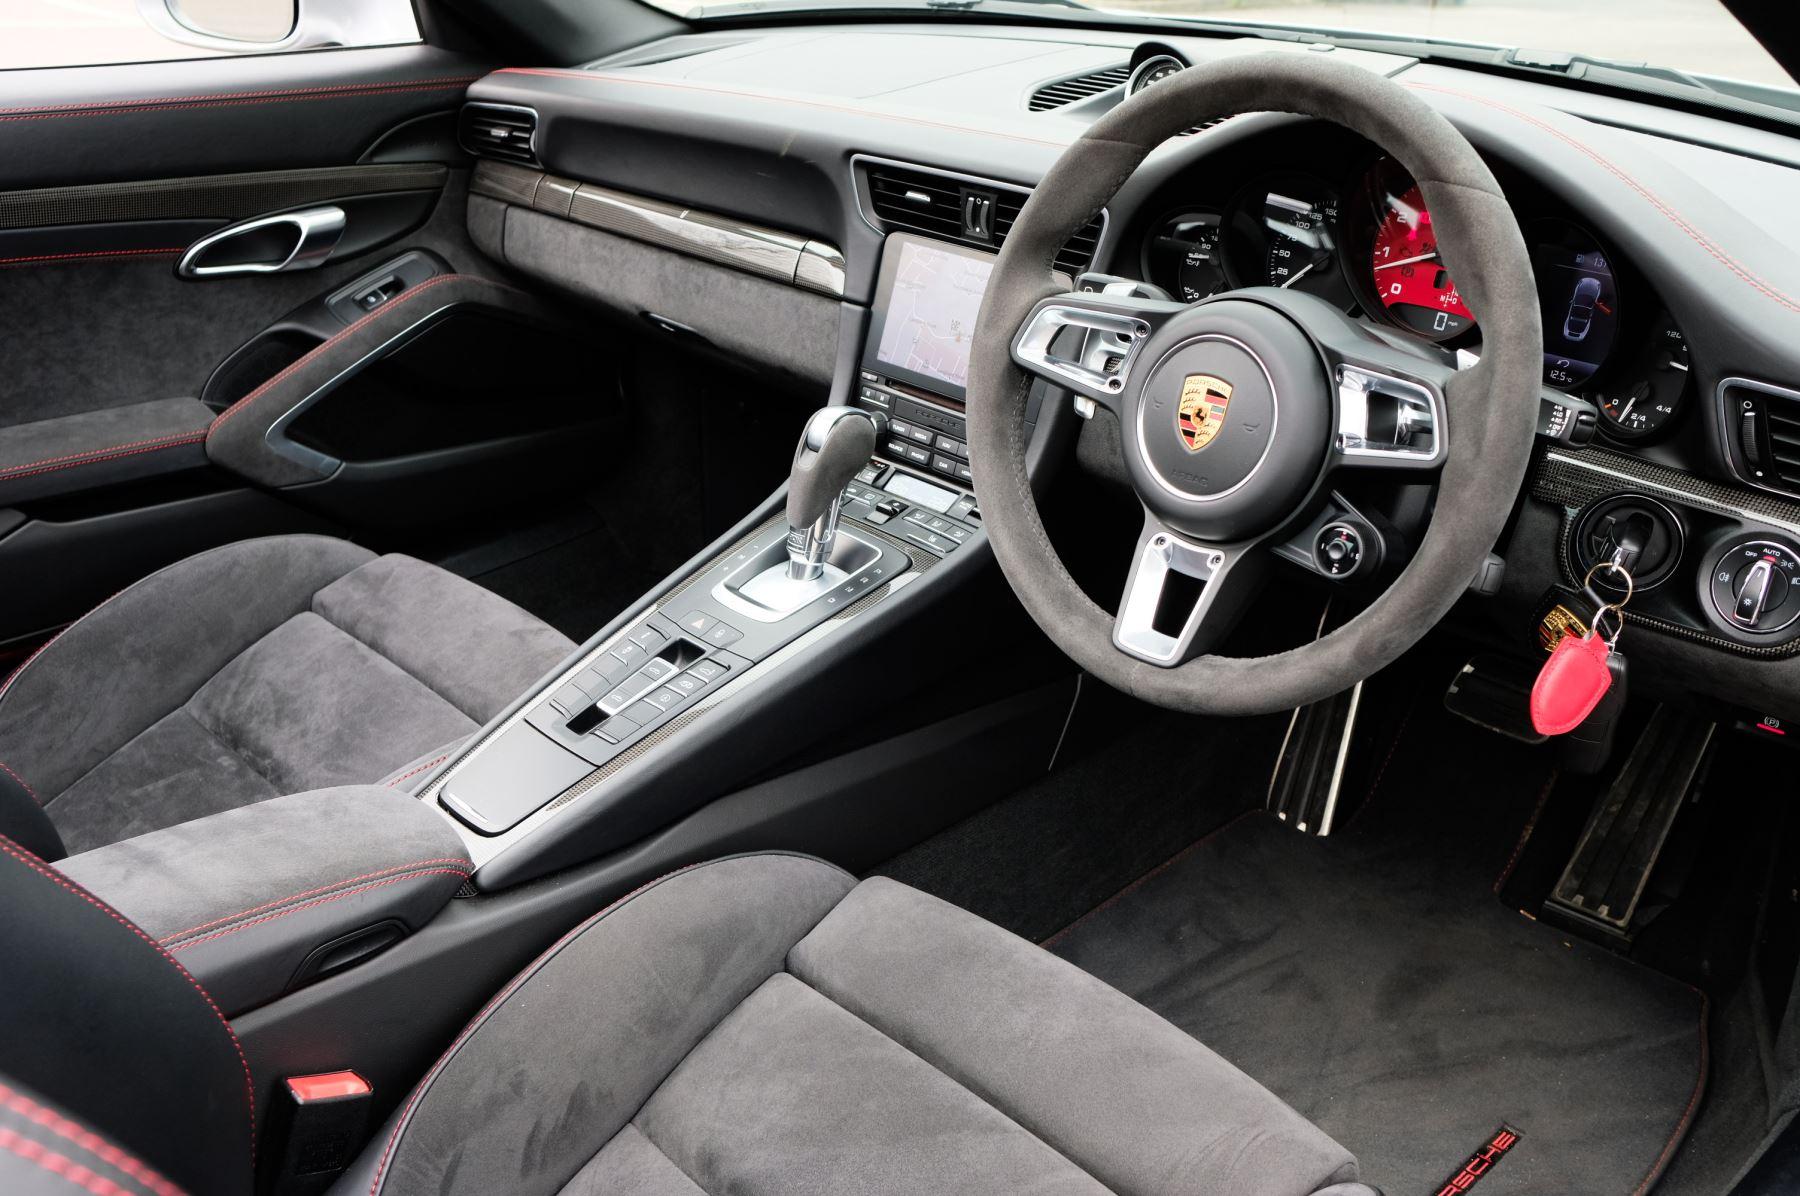 Porsche 911 TARGA 4 GTS - PDK - SPORT DESIGN PACKAGE - GTS INTERIOR PACKAGE image 15